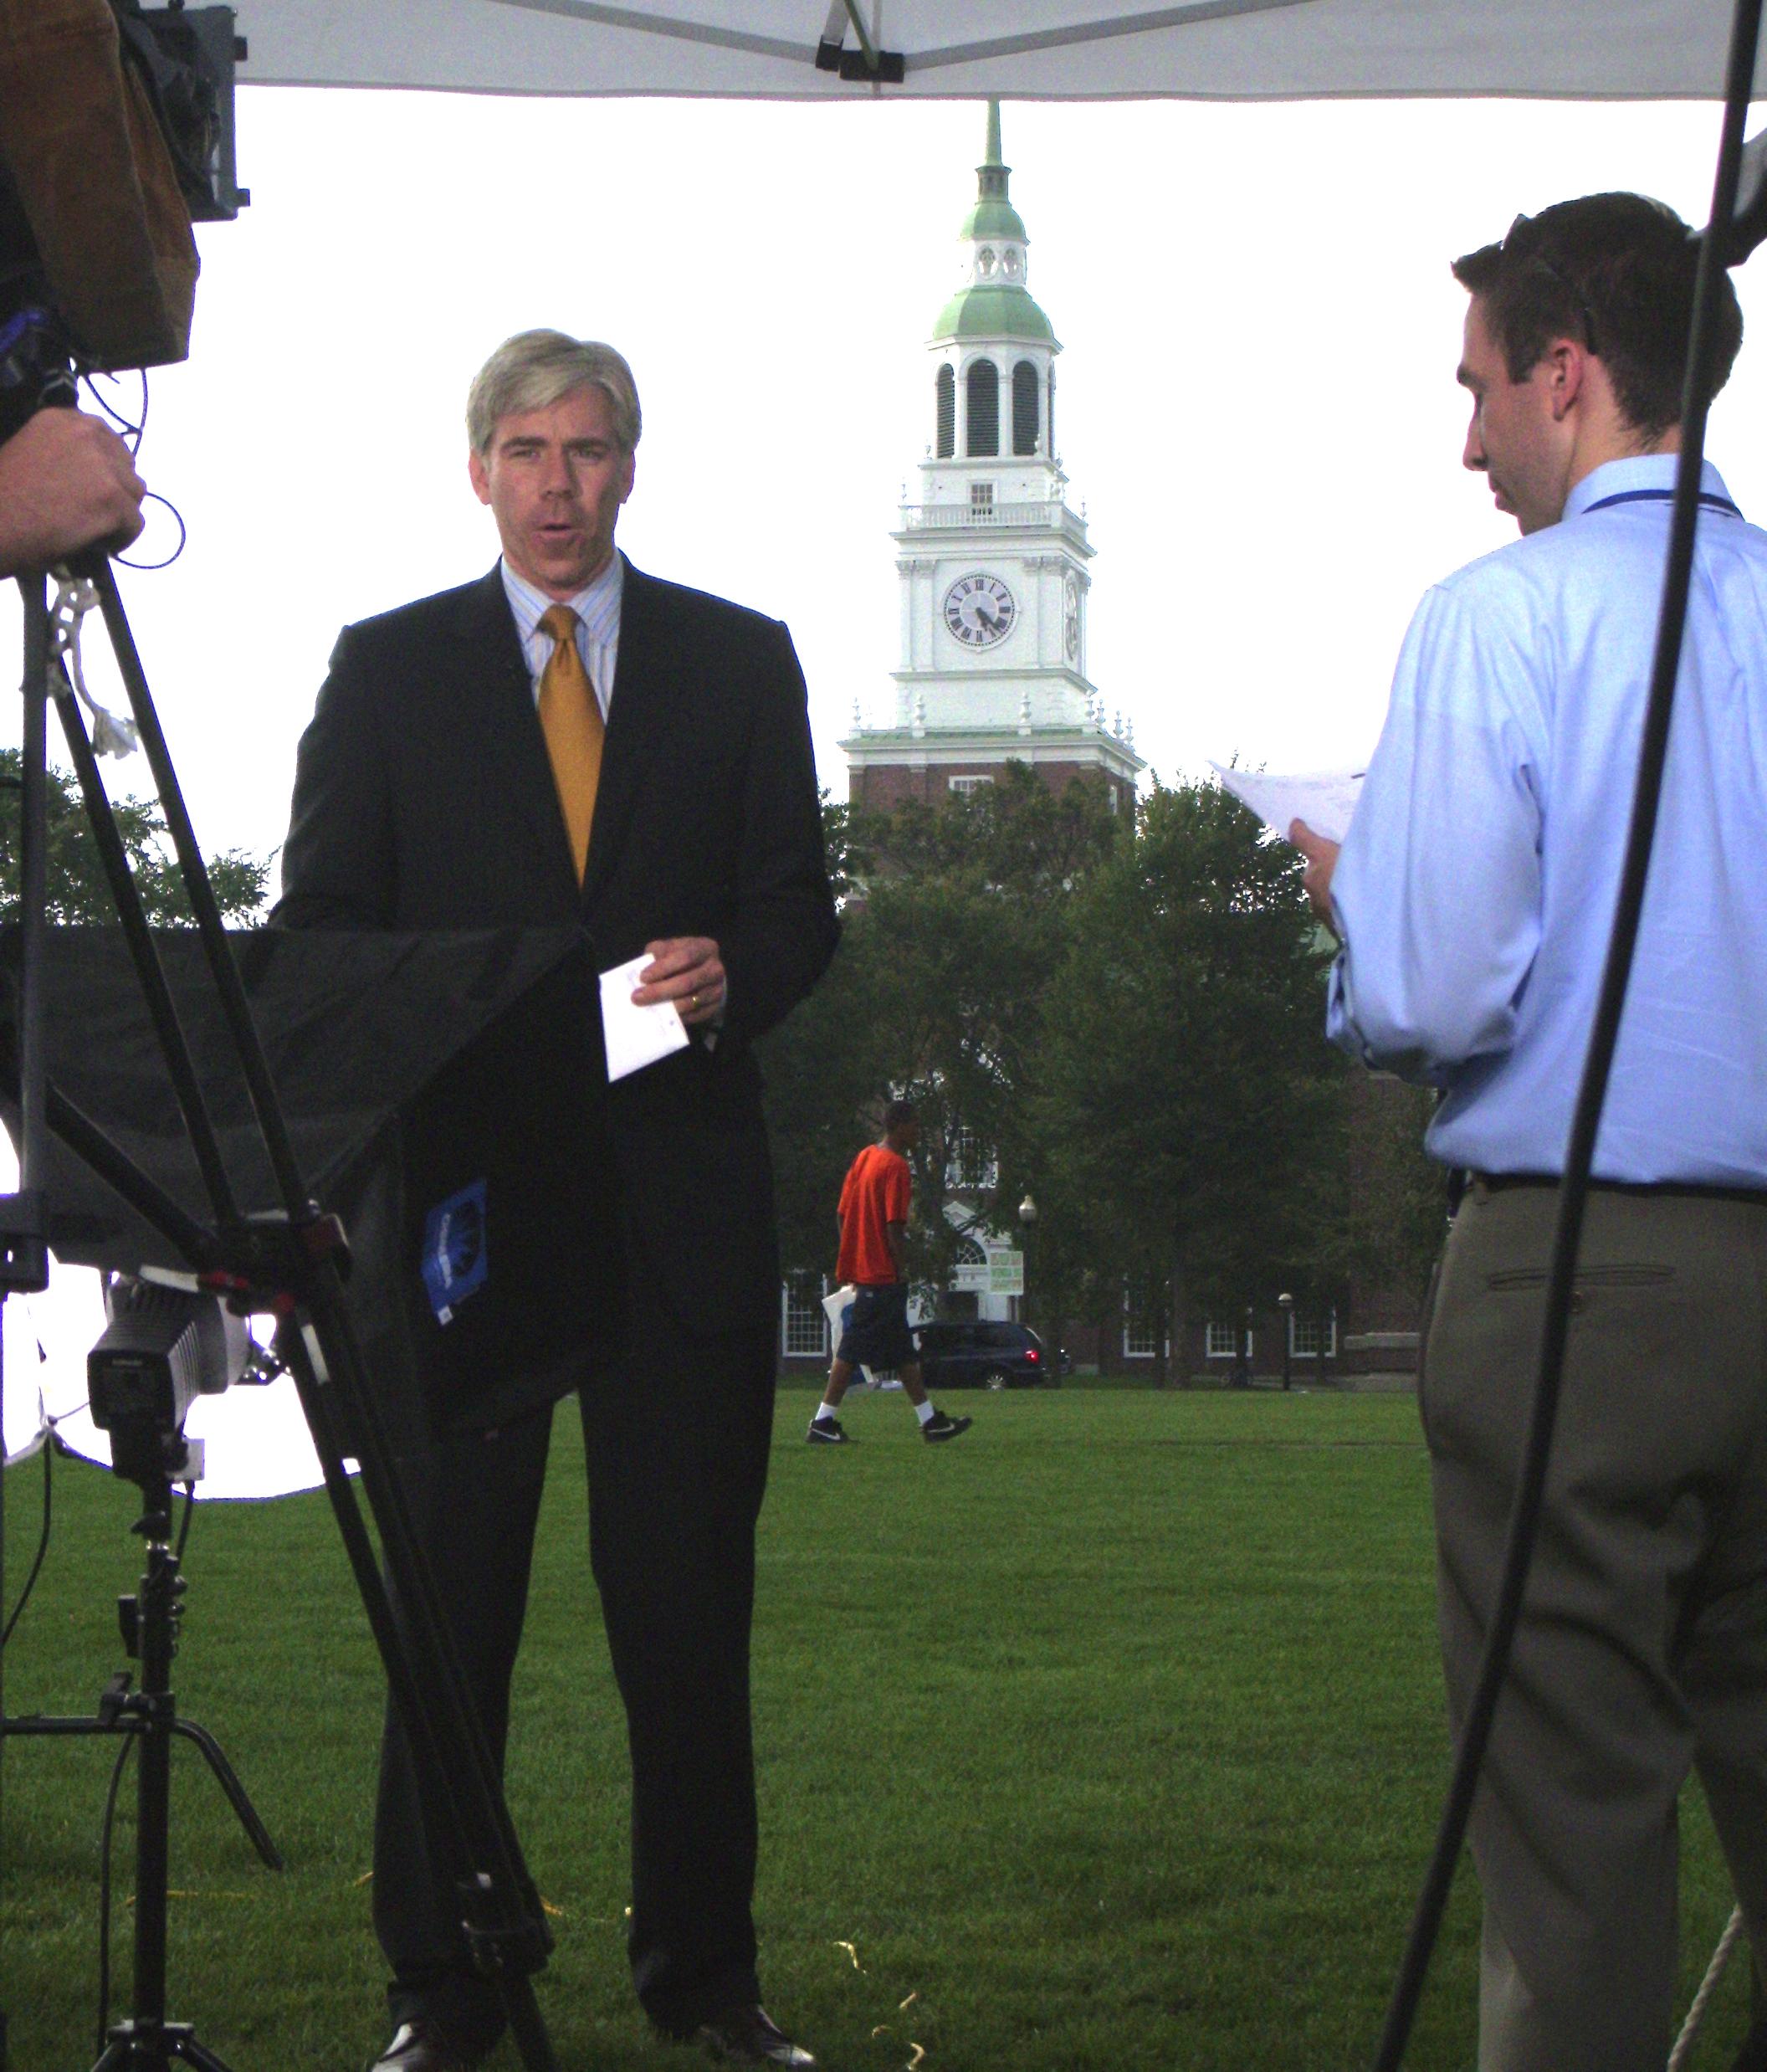 meet the press guest moderators for presidential debates